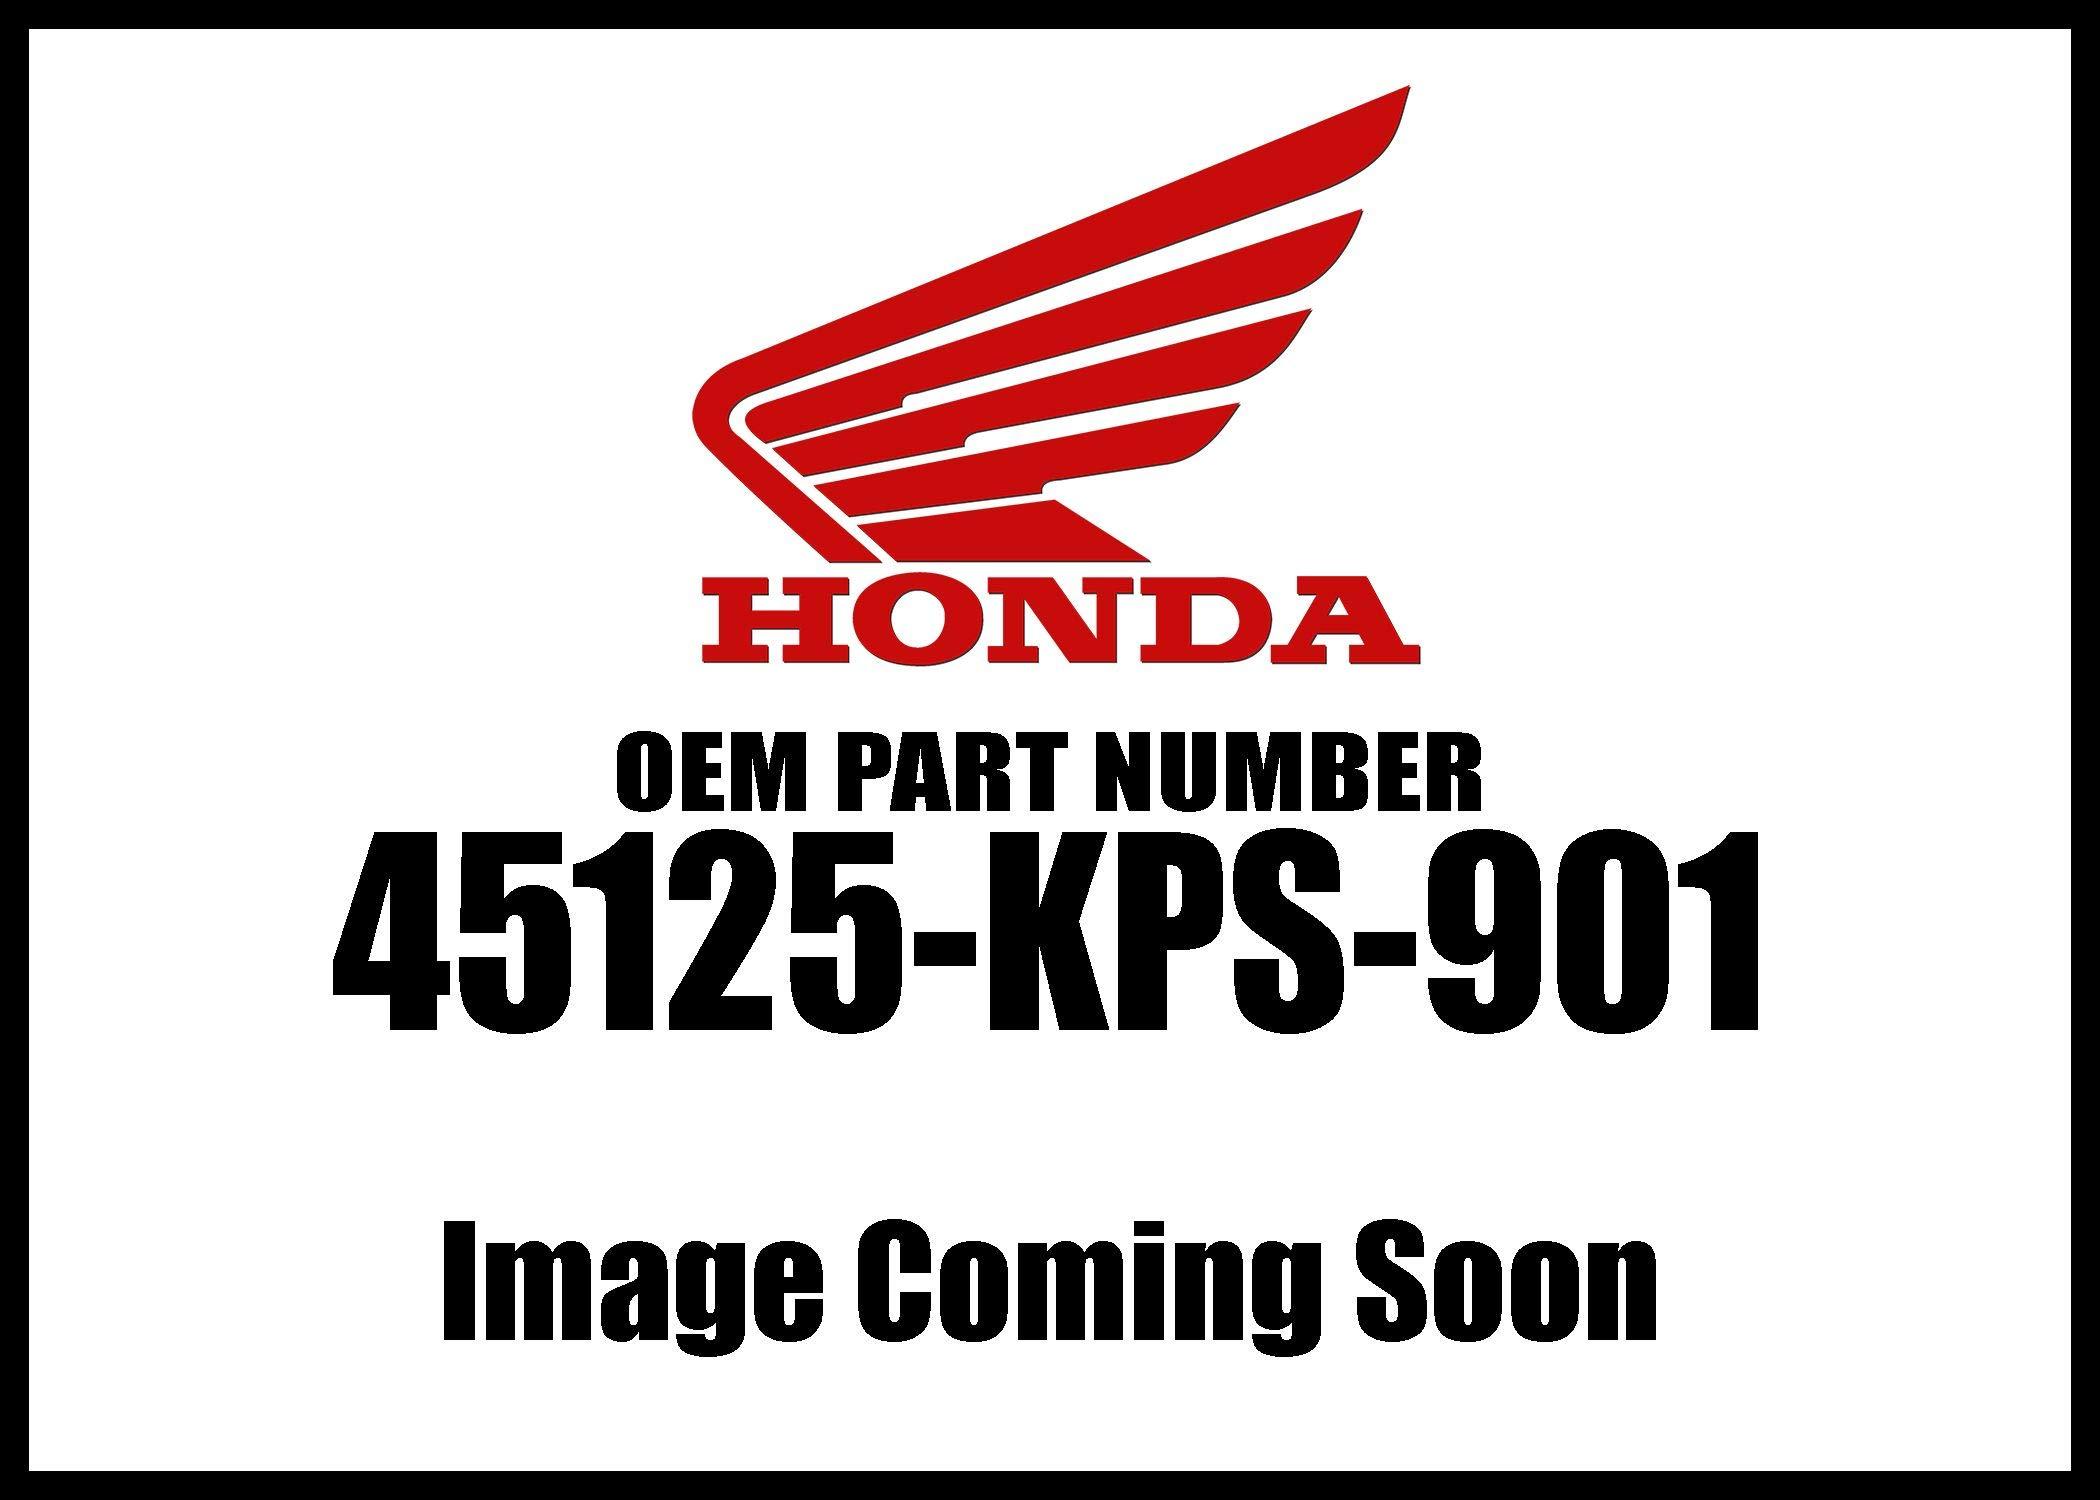 HONDA 45125-KPS-901 HOSE, FR. BRAKE